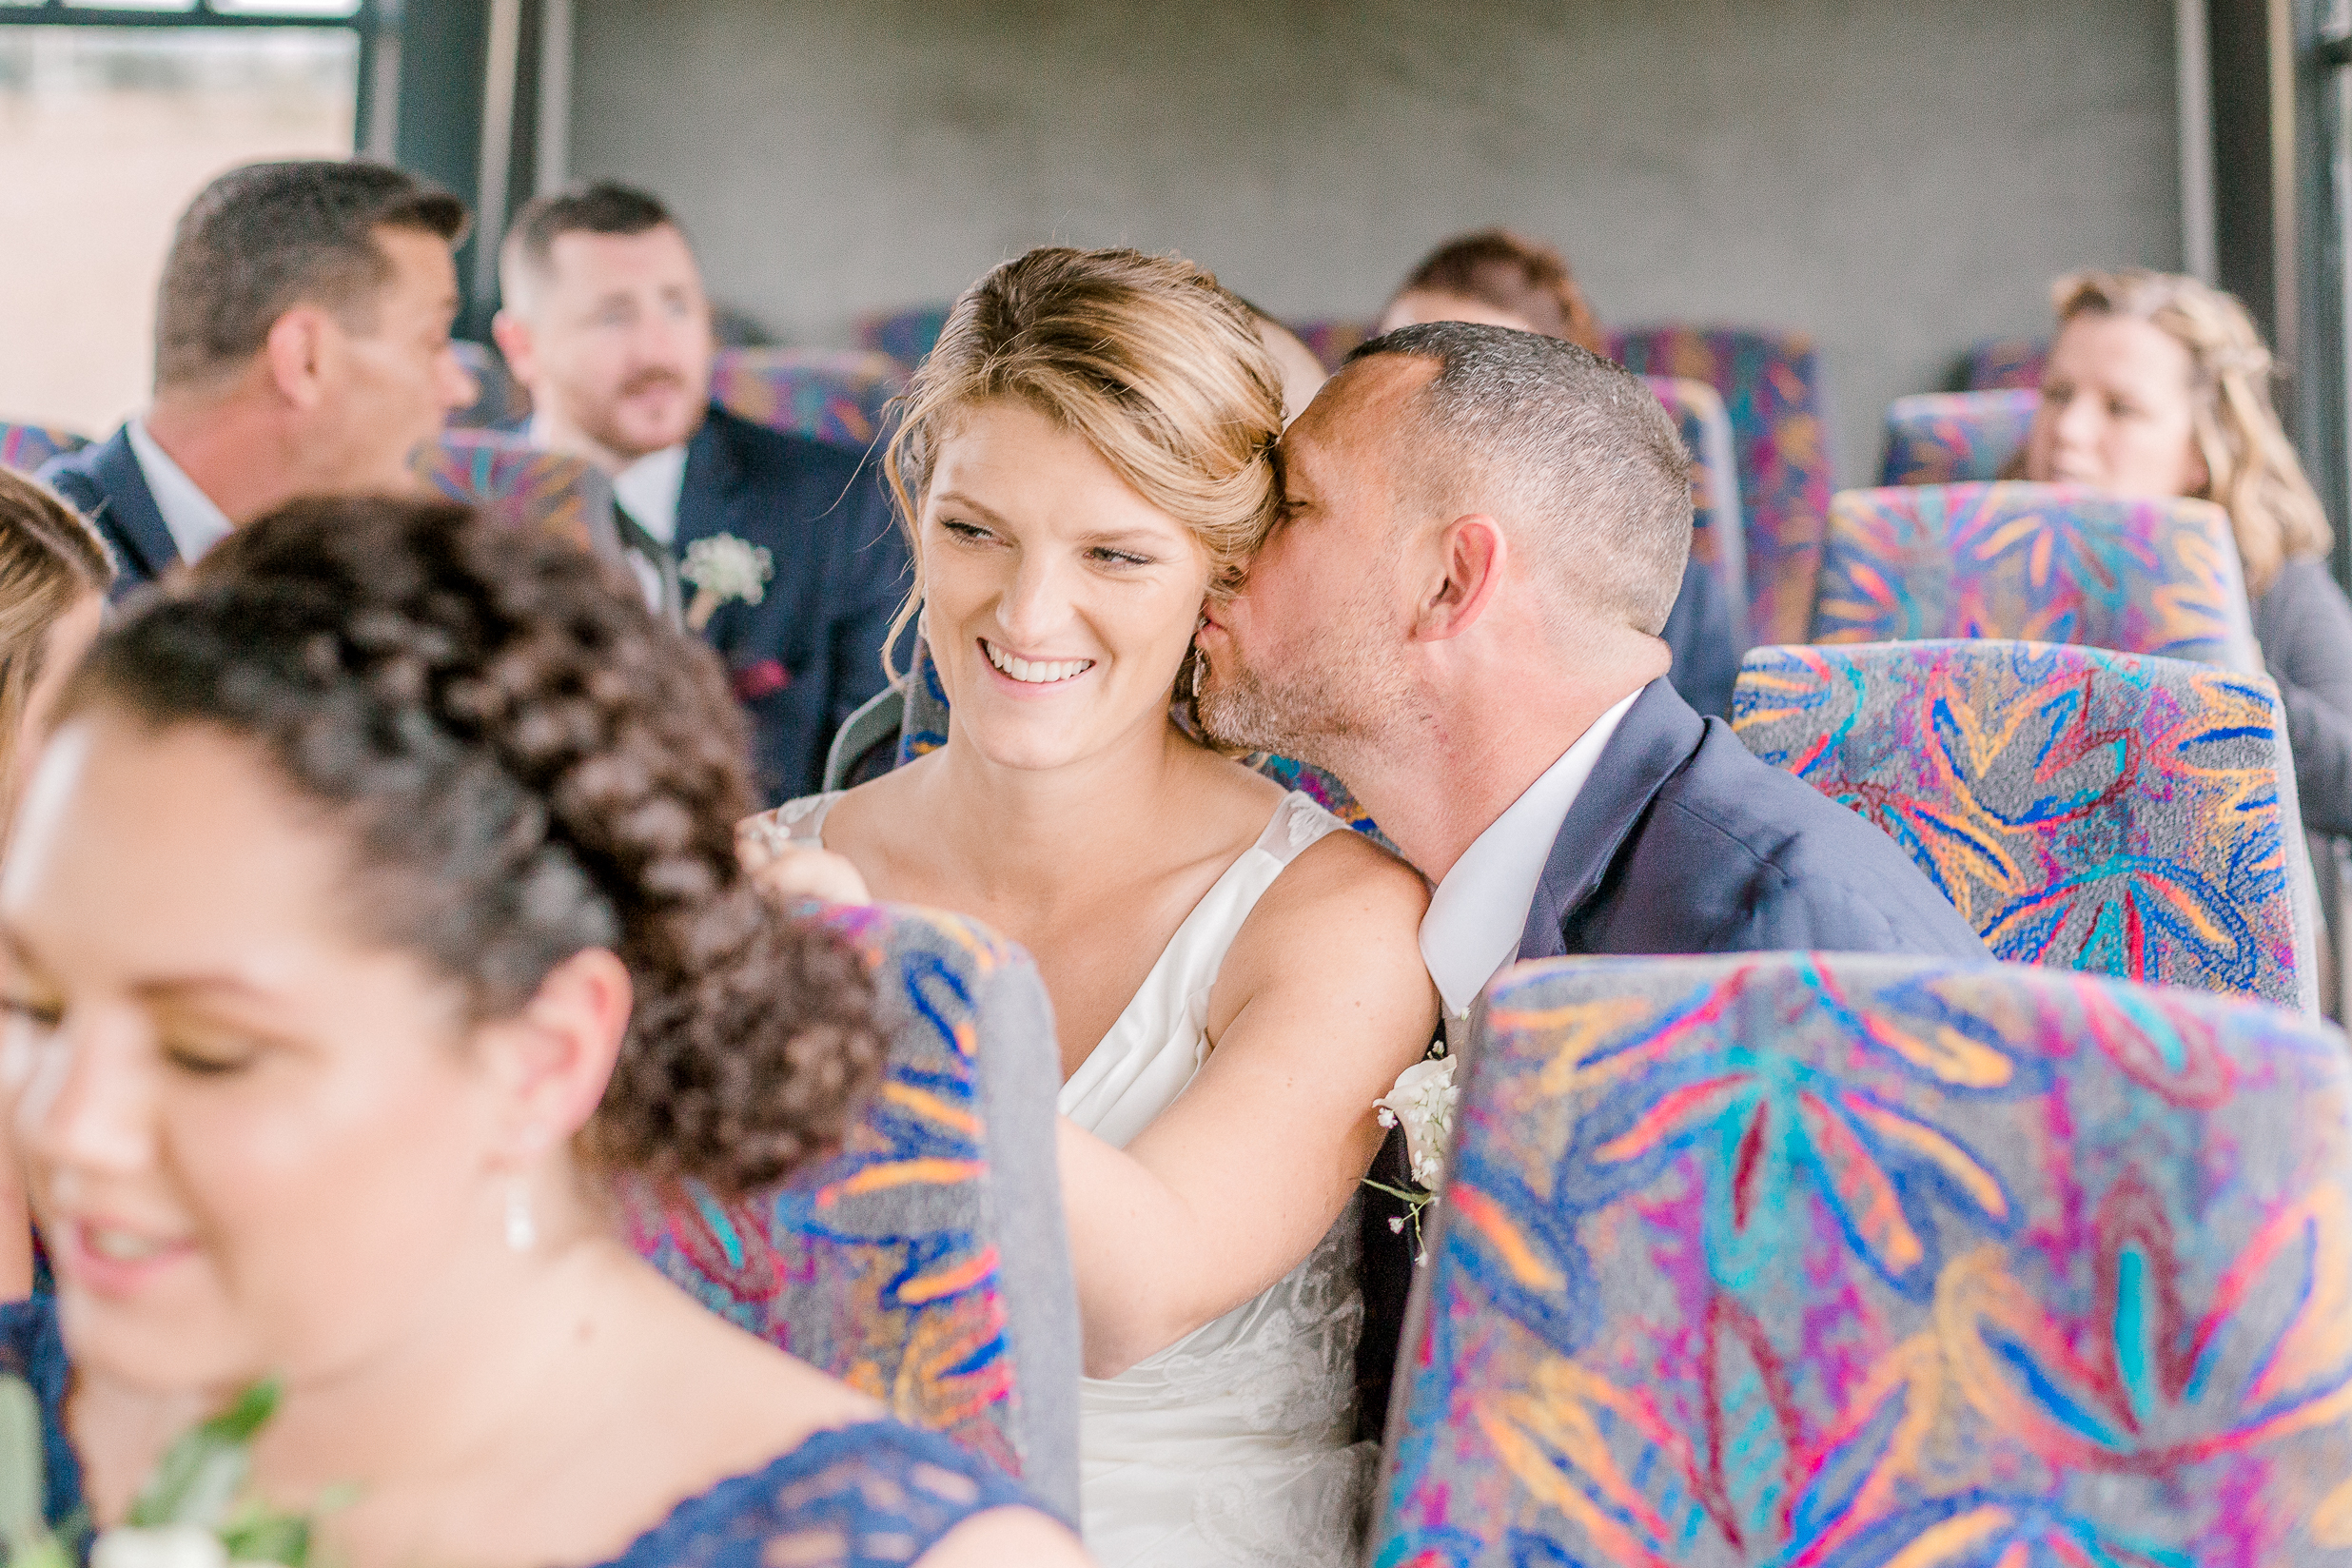 Pennsylvania October Fall Lehigh Valley wedding and lifestyle photographer Lytle Photo Co (57 of 167).jpg